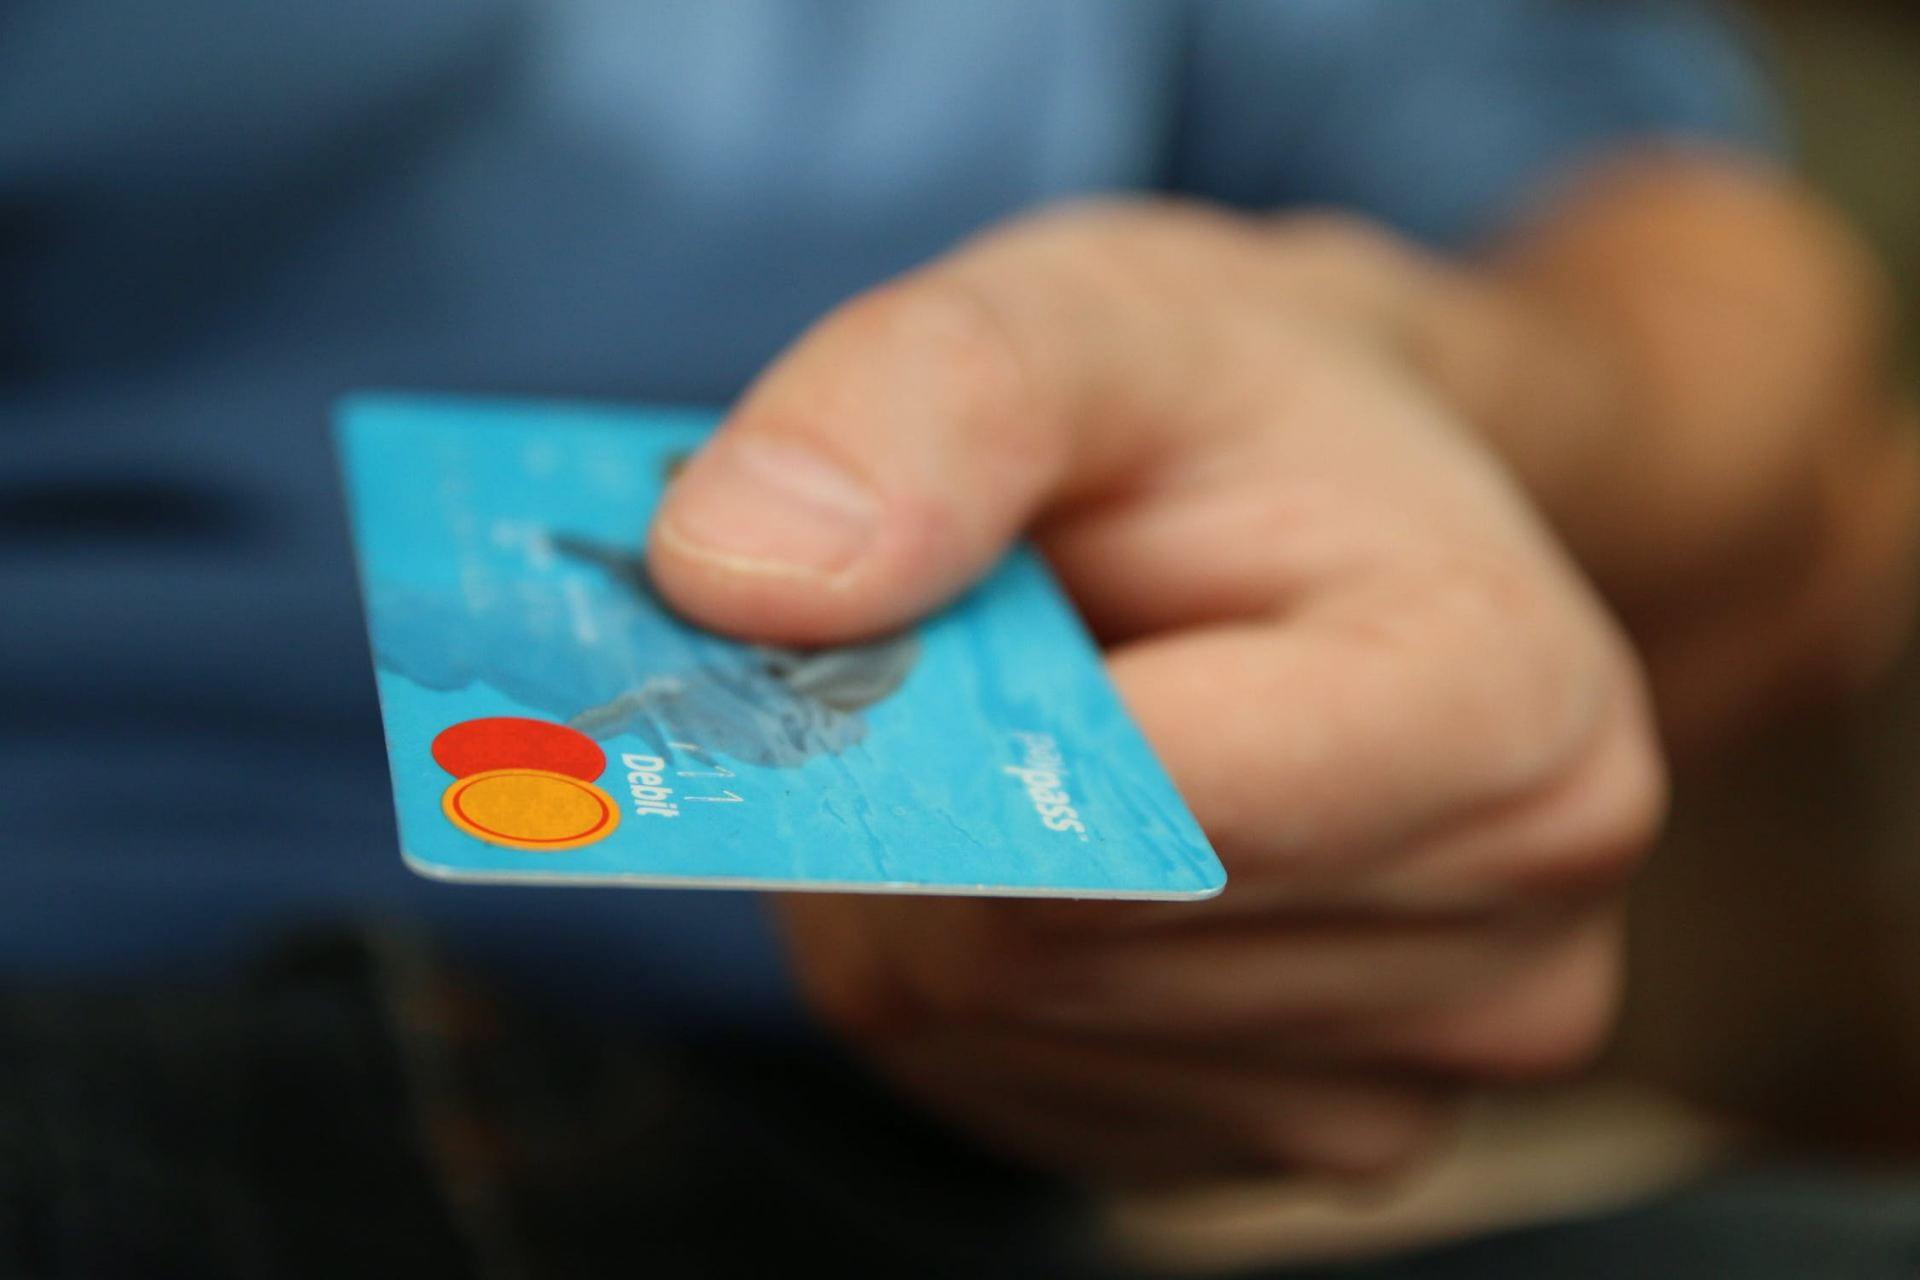 A hand holding a debit card forward.